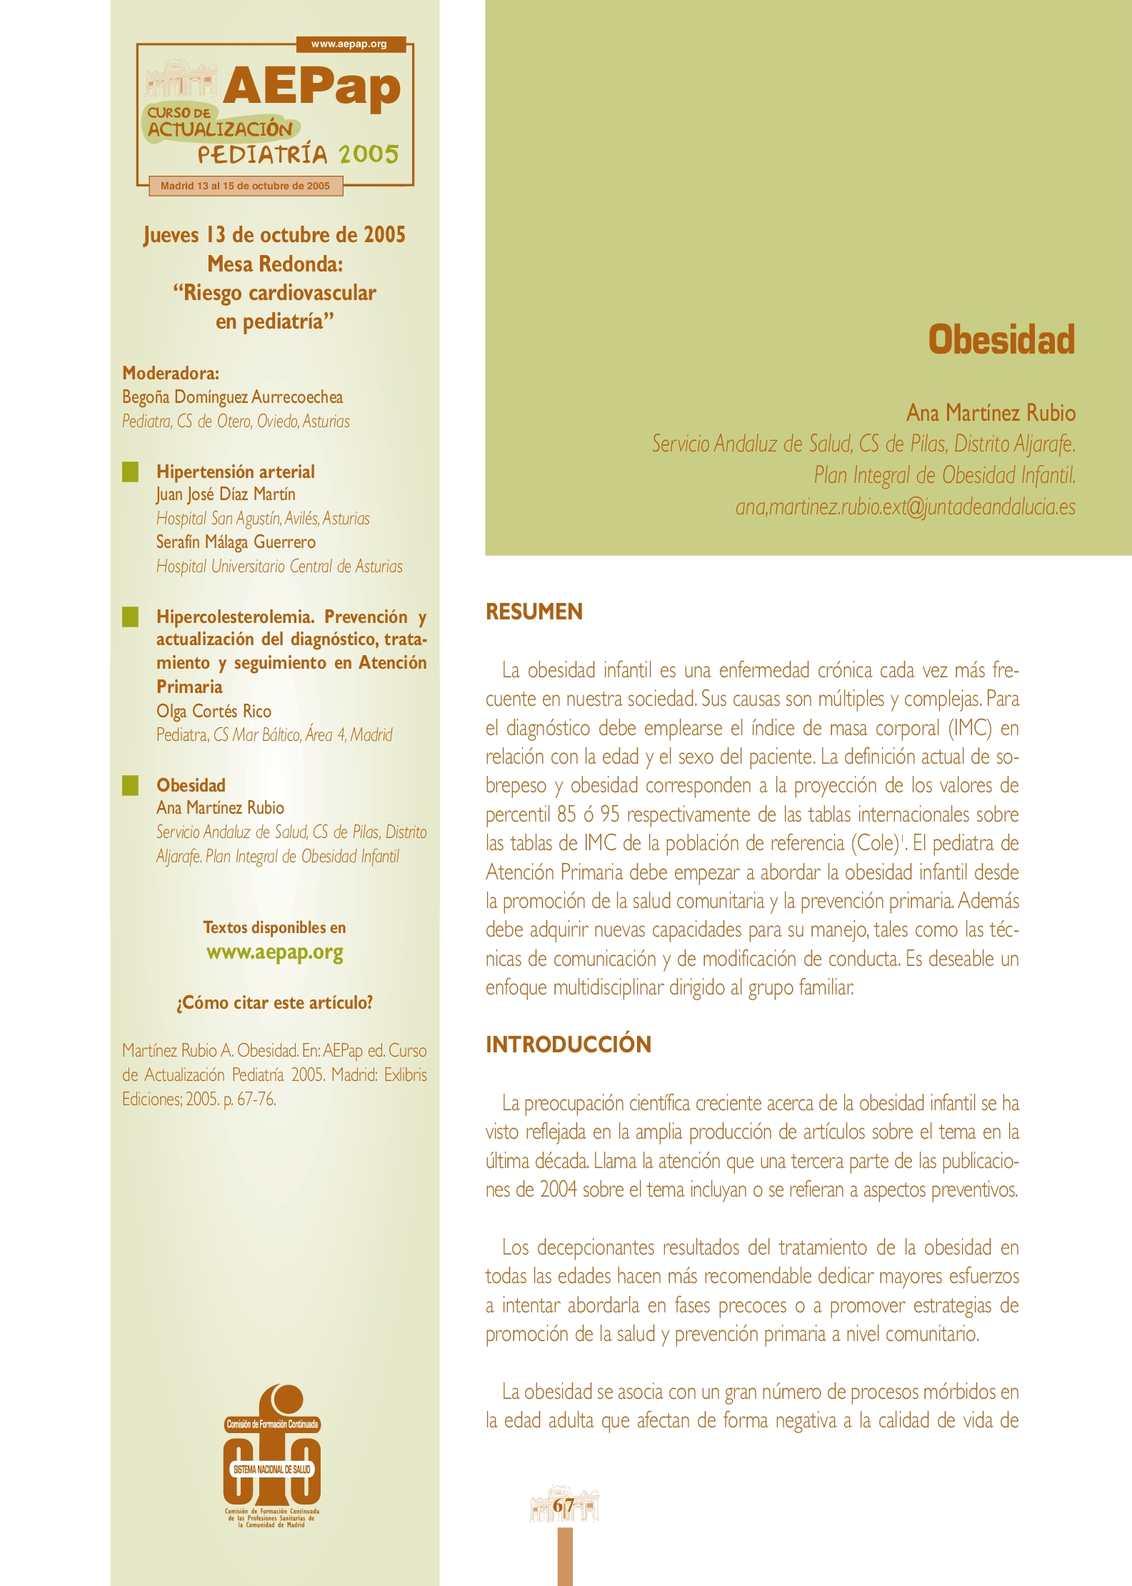 Obesidad intracraneal benigna obesidad